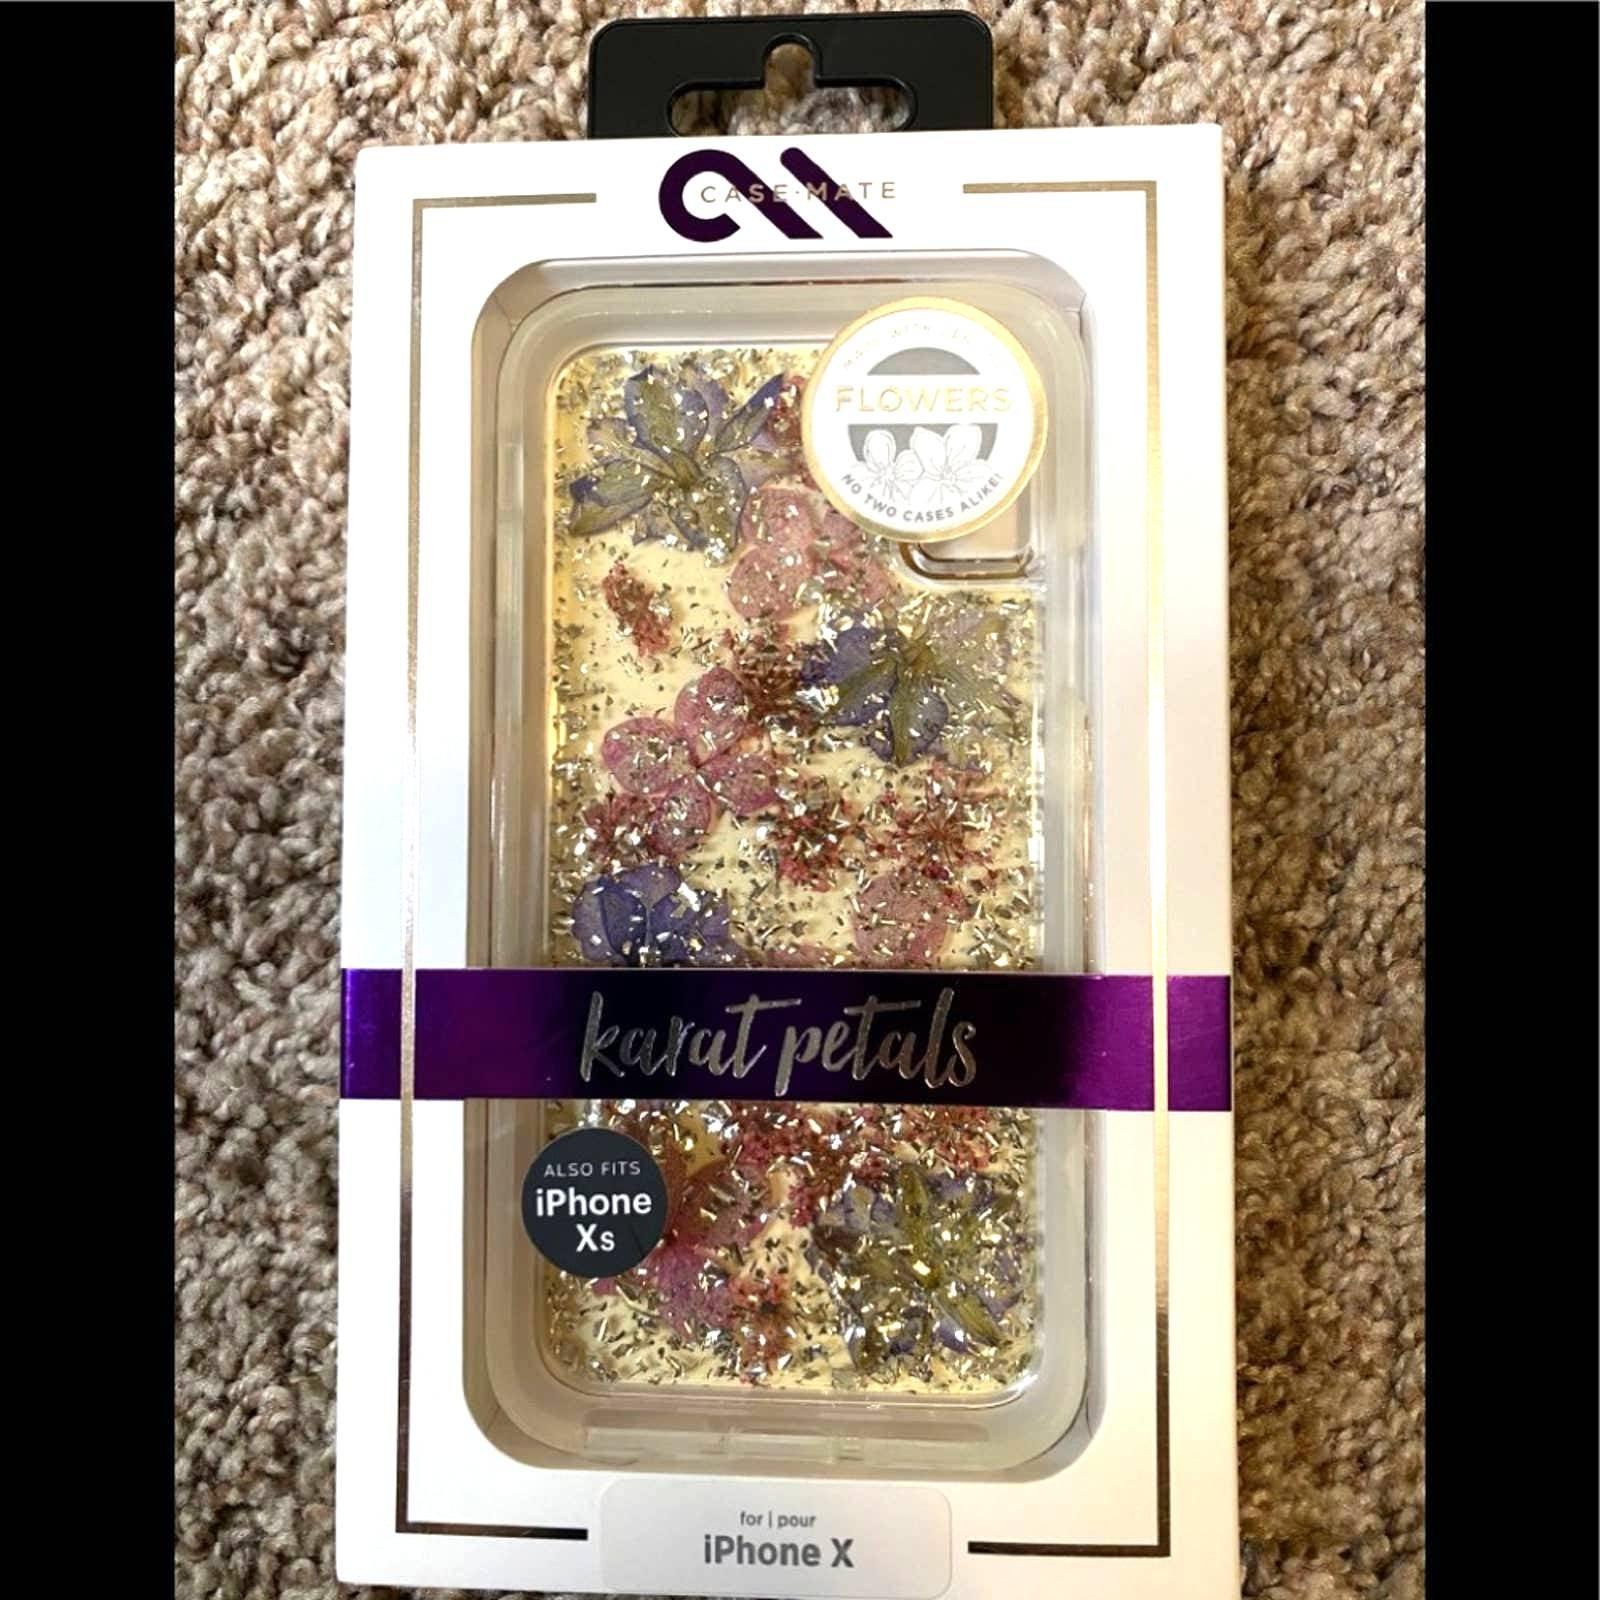 Case-mate Karat petals iPhone X/XS case